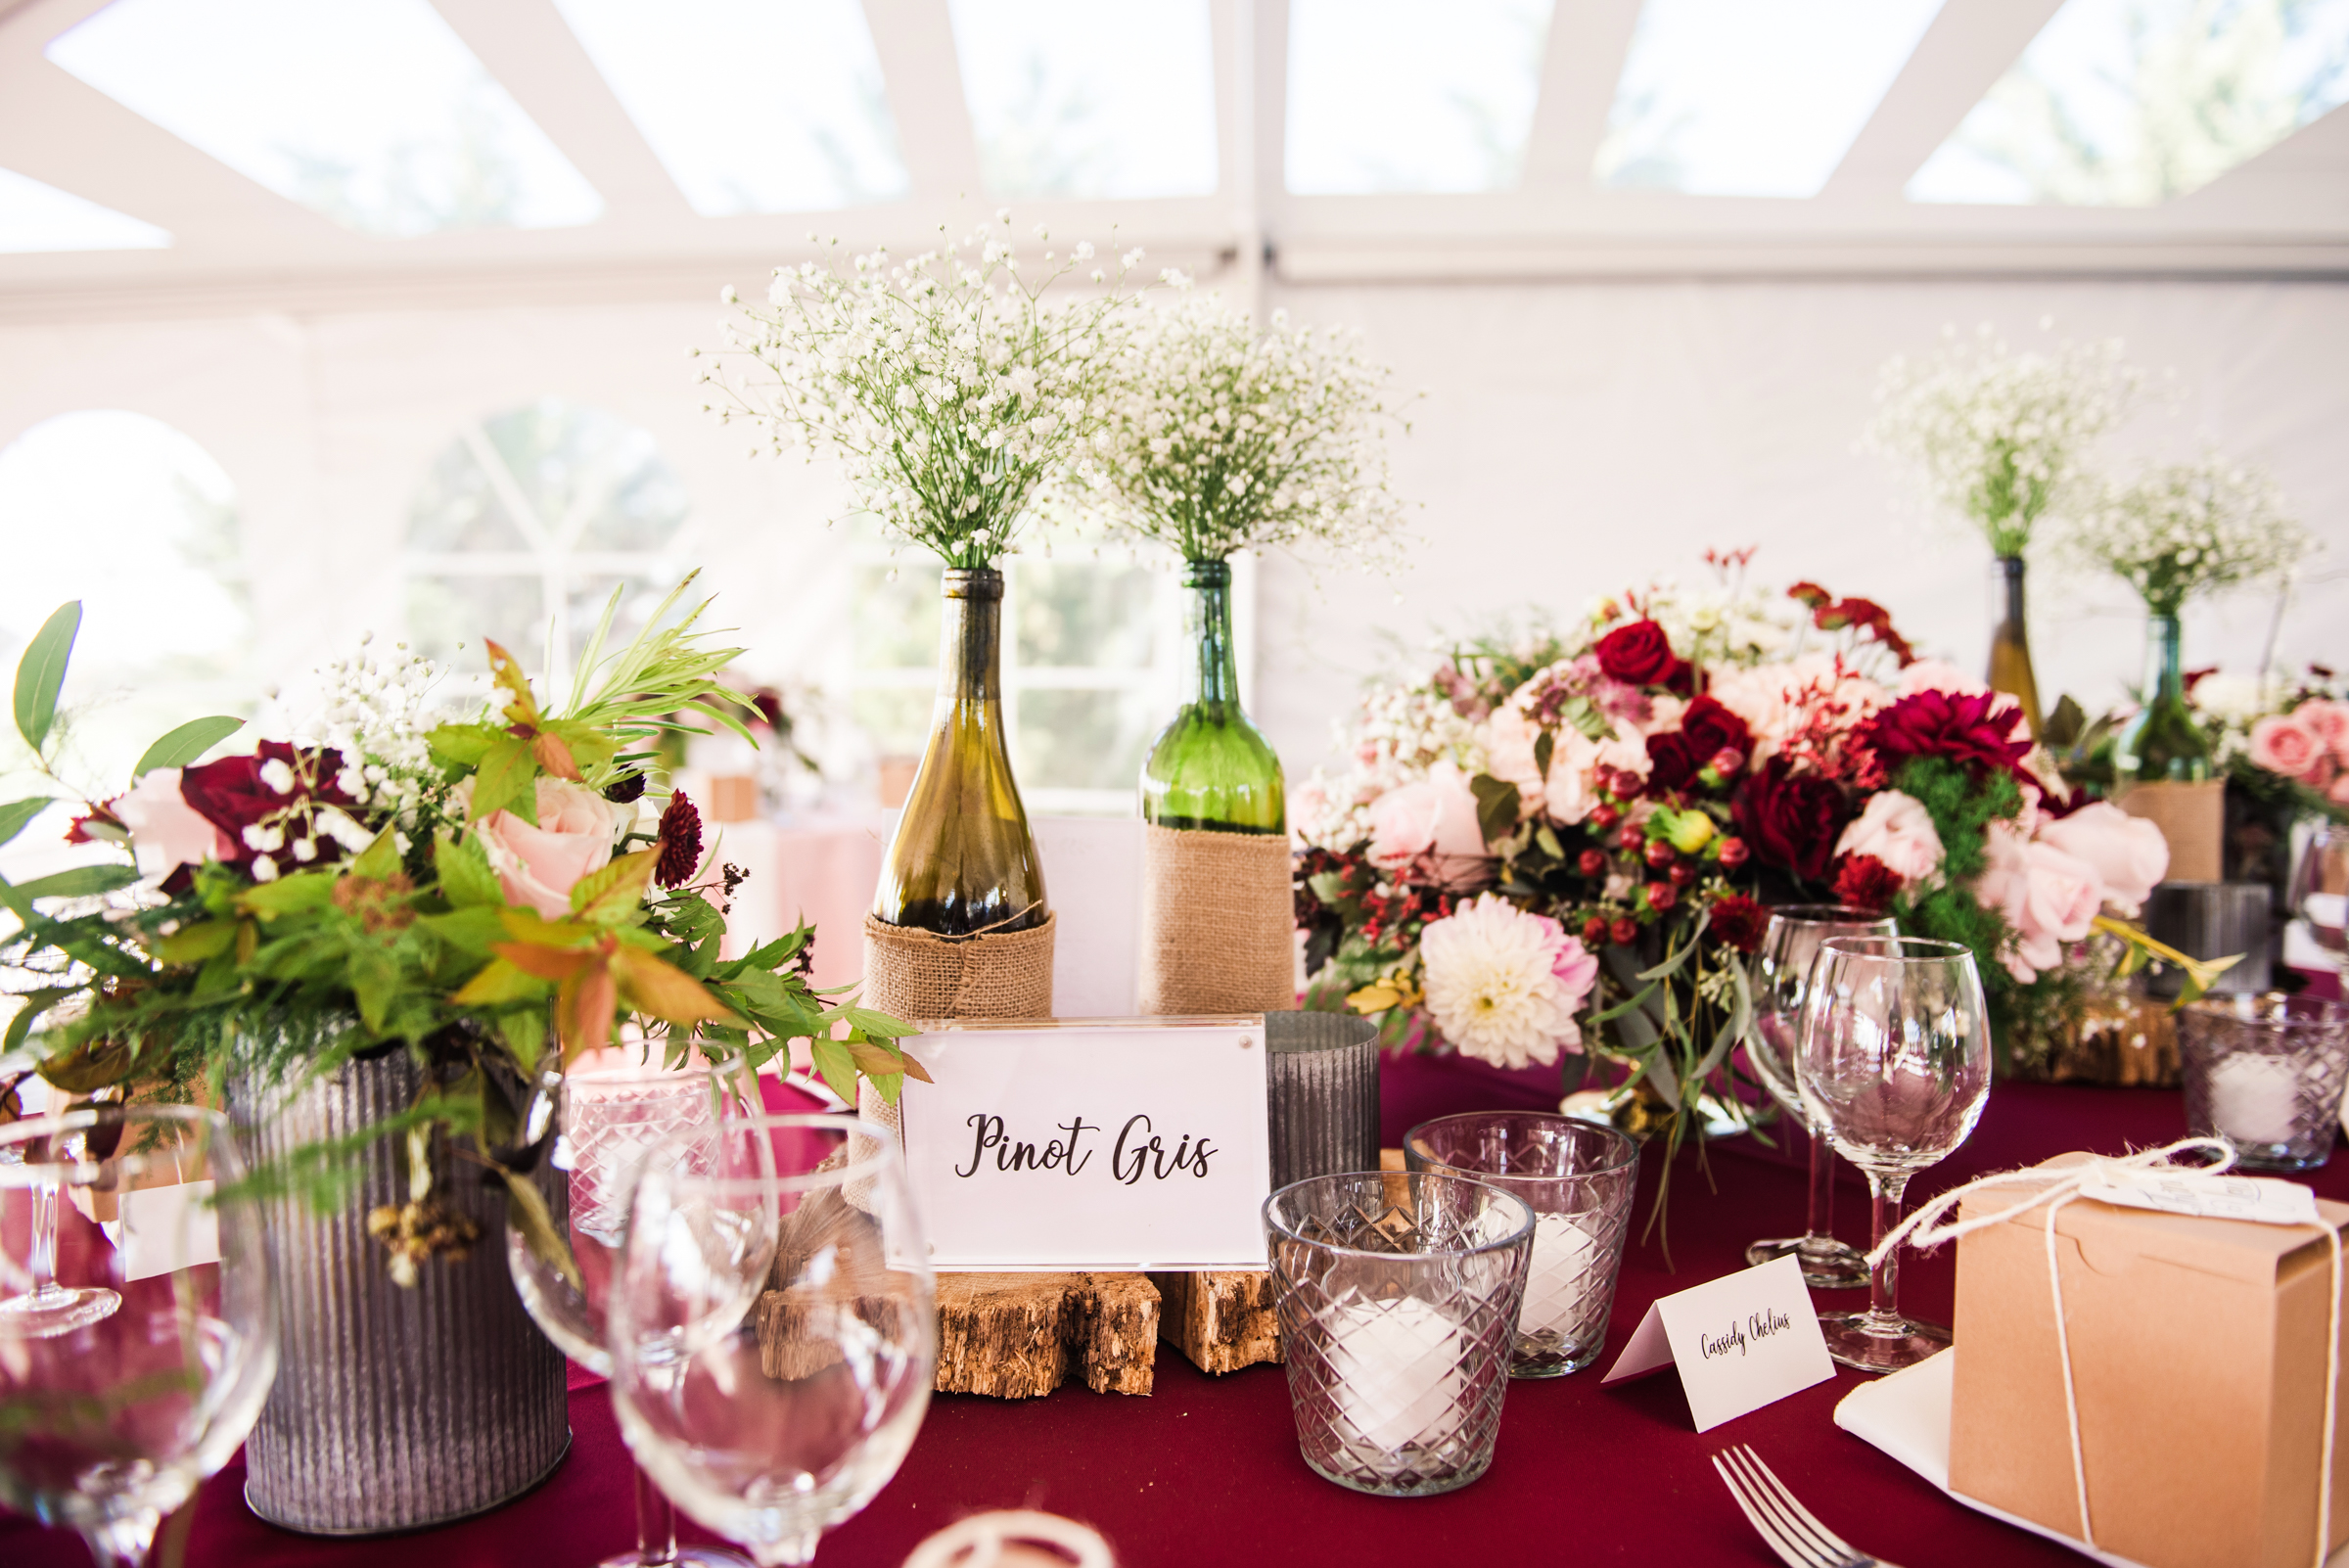 Zugibe_Vineyards_Finger_Lakes_Wedding_JILL_STUDIO_Rochester_NY_Photographer_DSC_3874.jpg